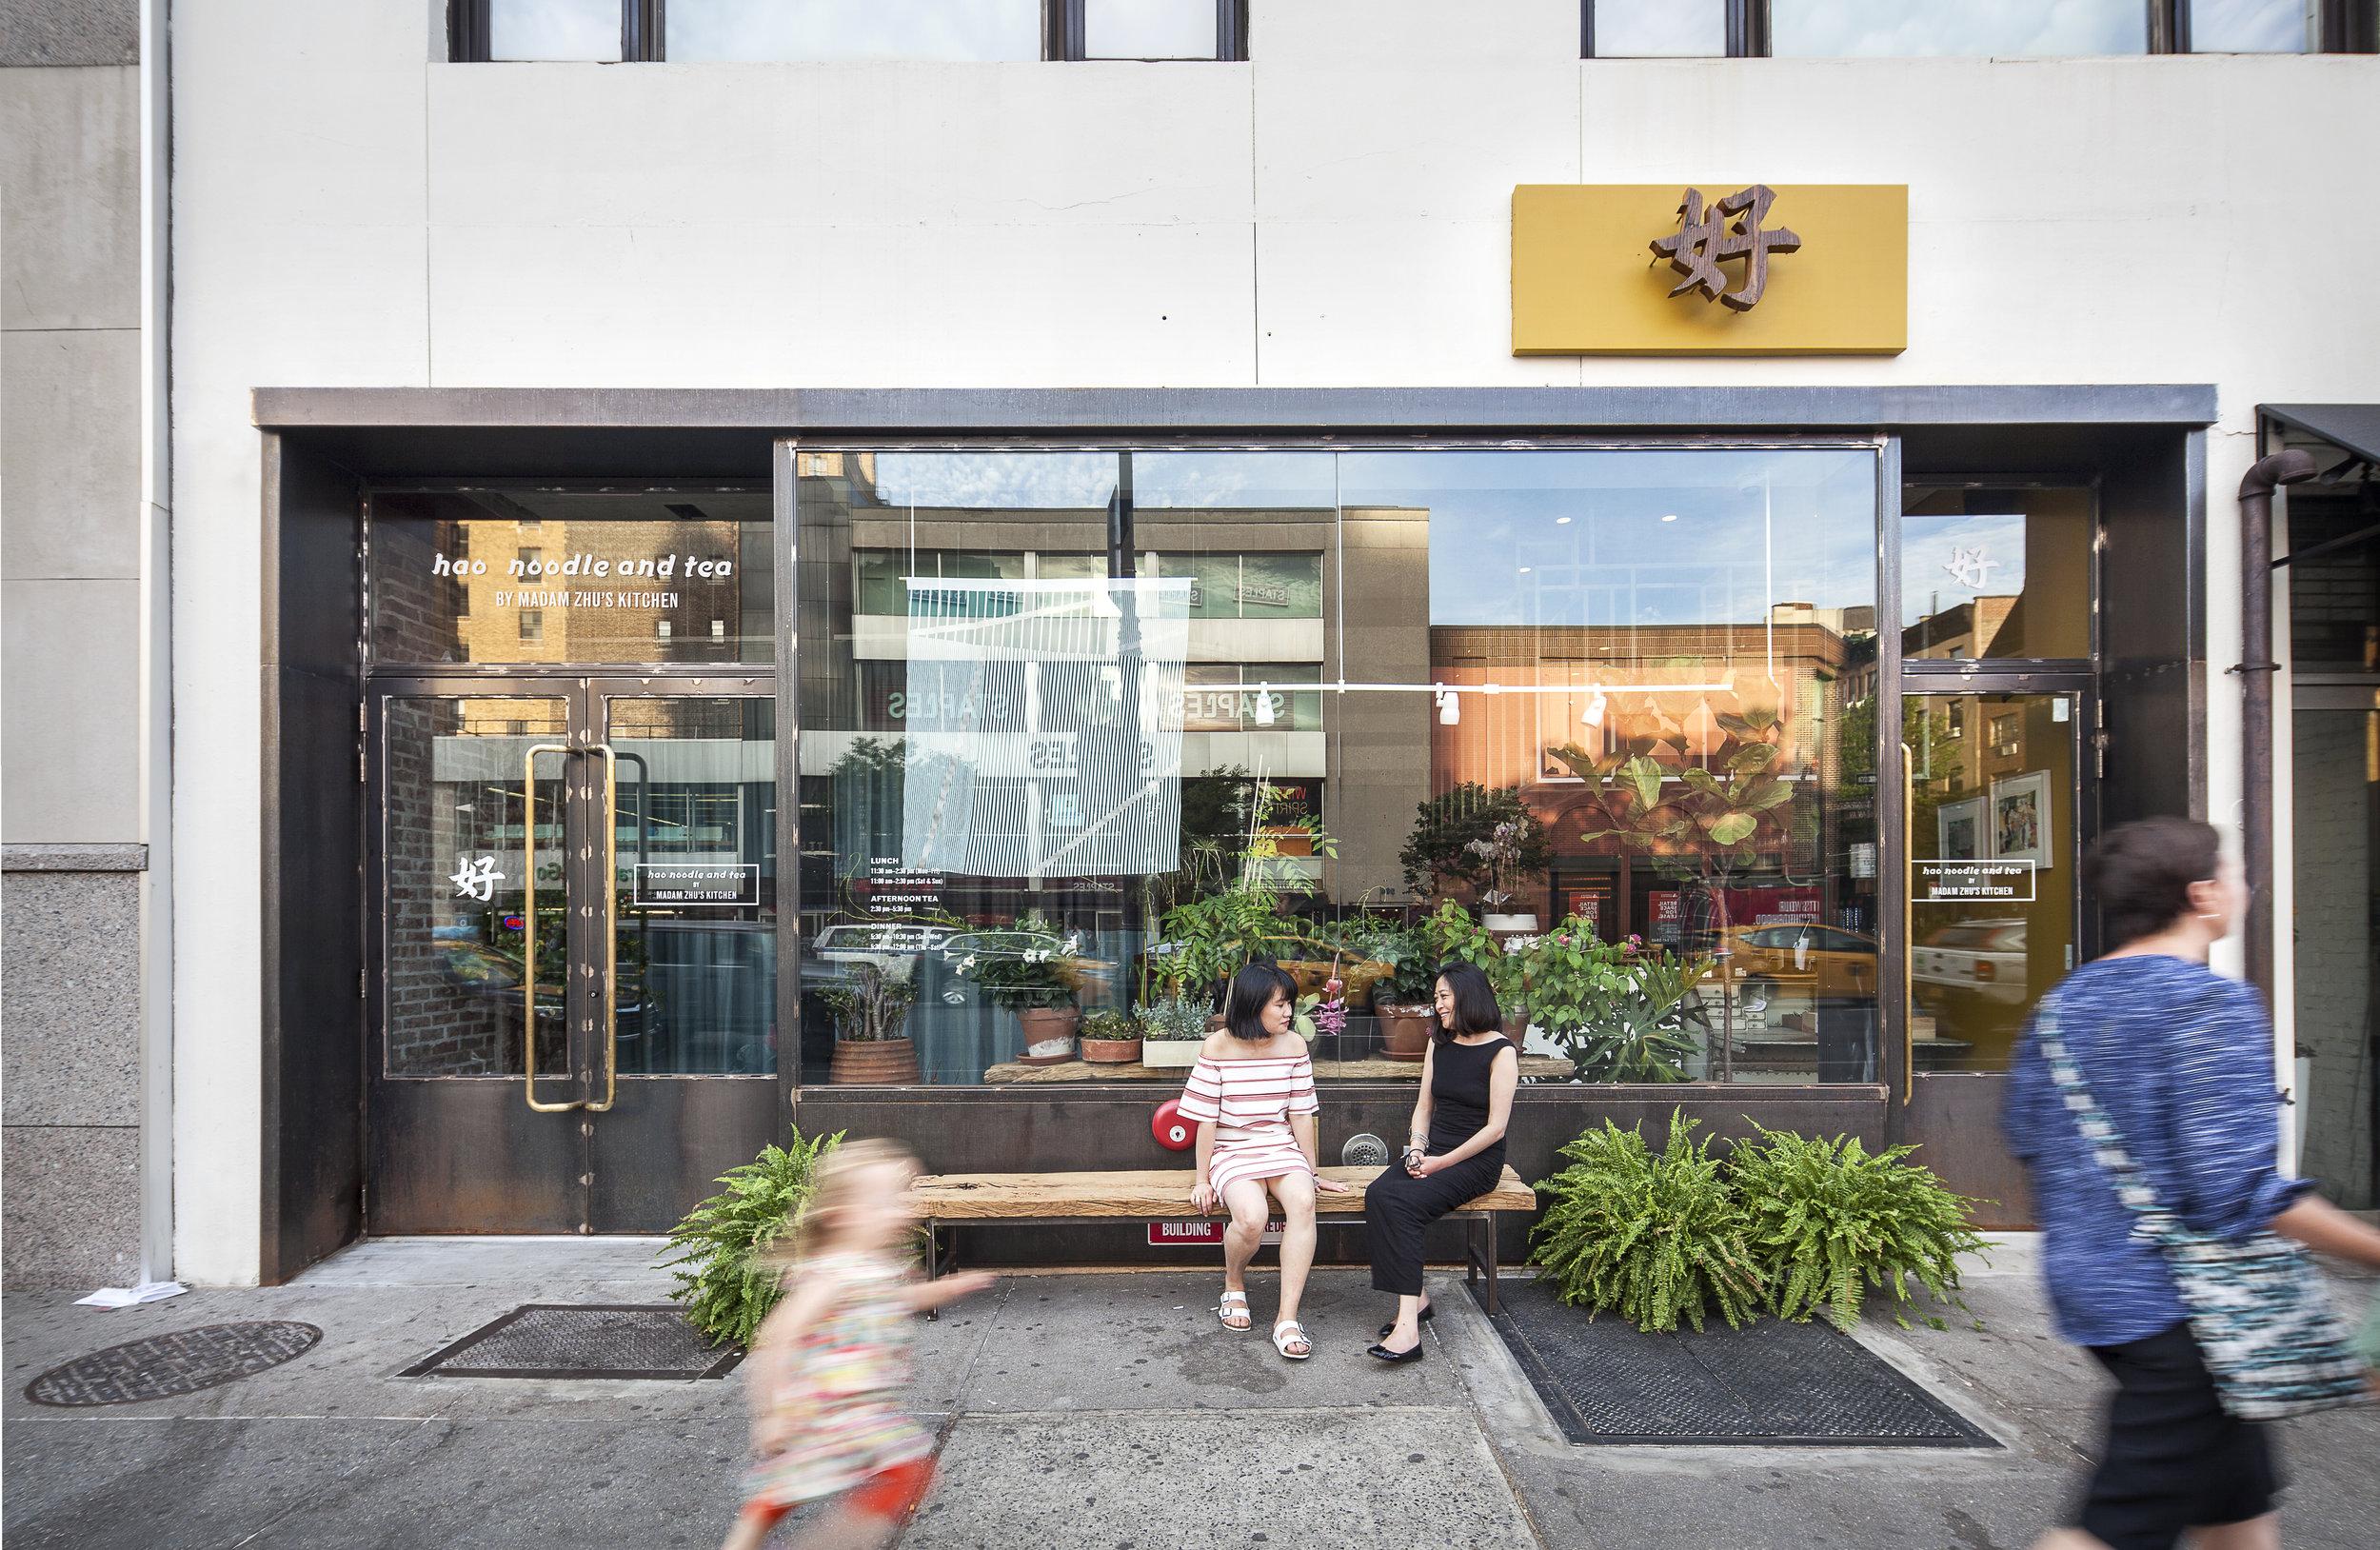 160619_MZ_Madame+Zhu's+Kitchen_0014_F.jpg